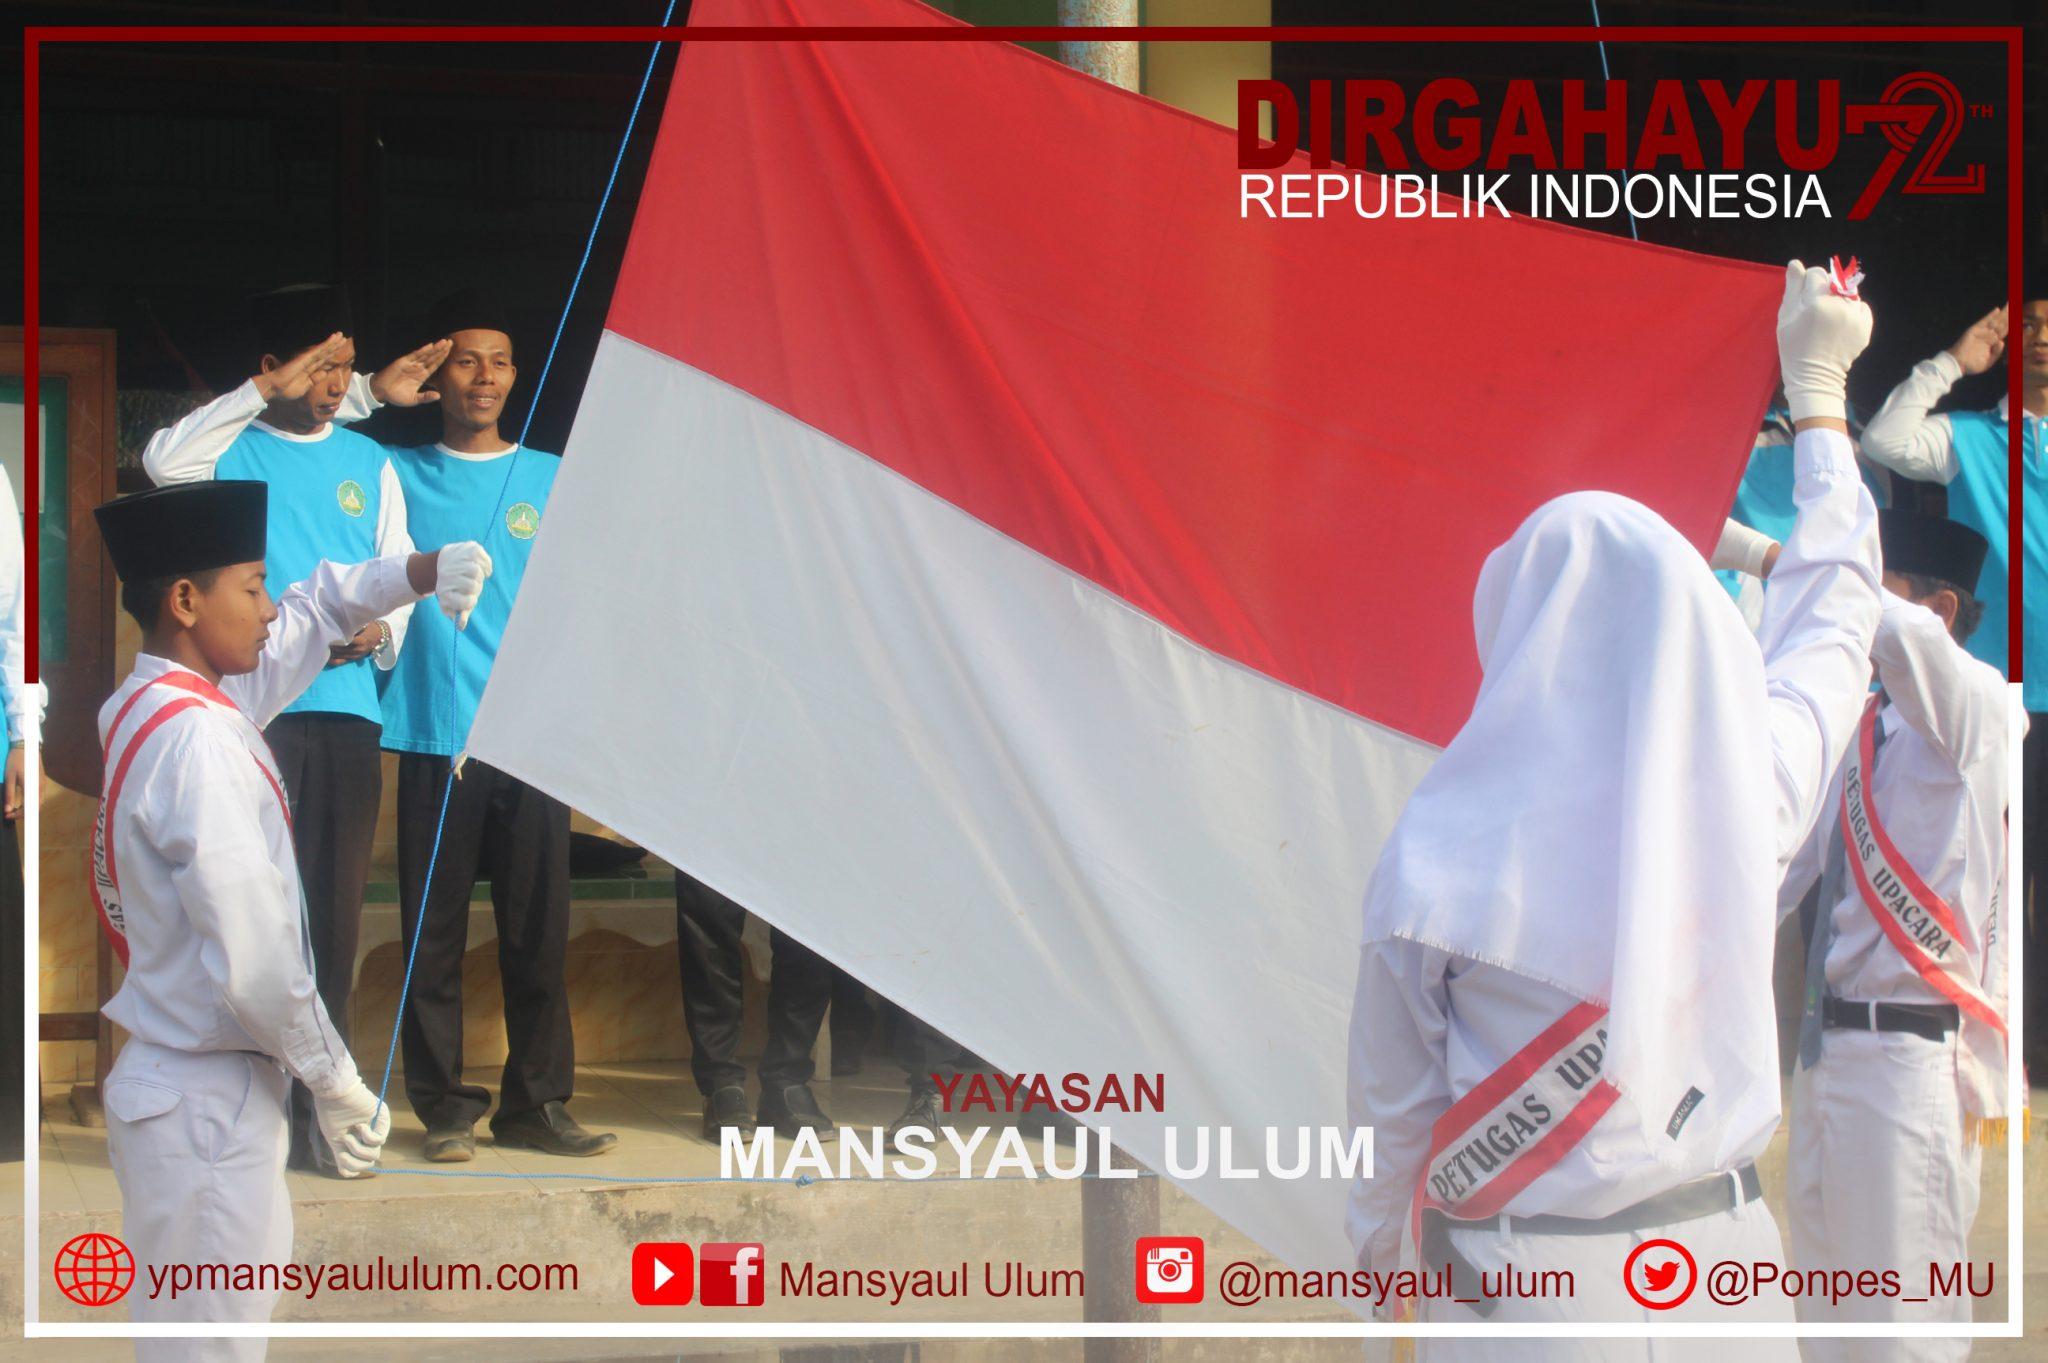 DIRGAHAYU REPUBLIK INDONESIA 72 YAYASAN MANSYAUL ULUM